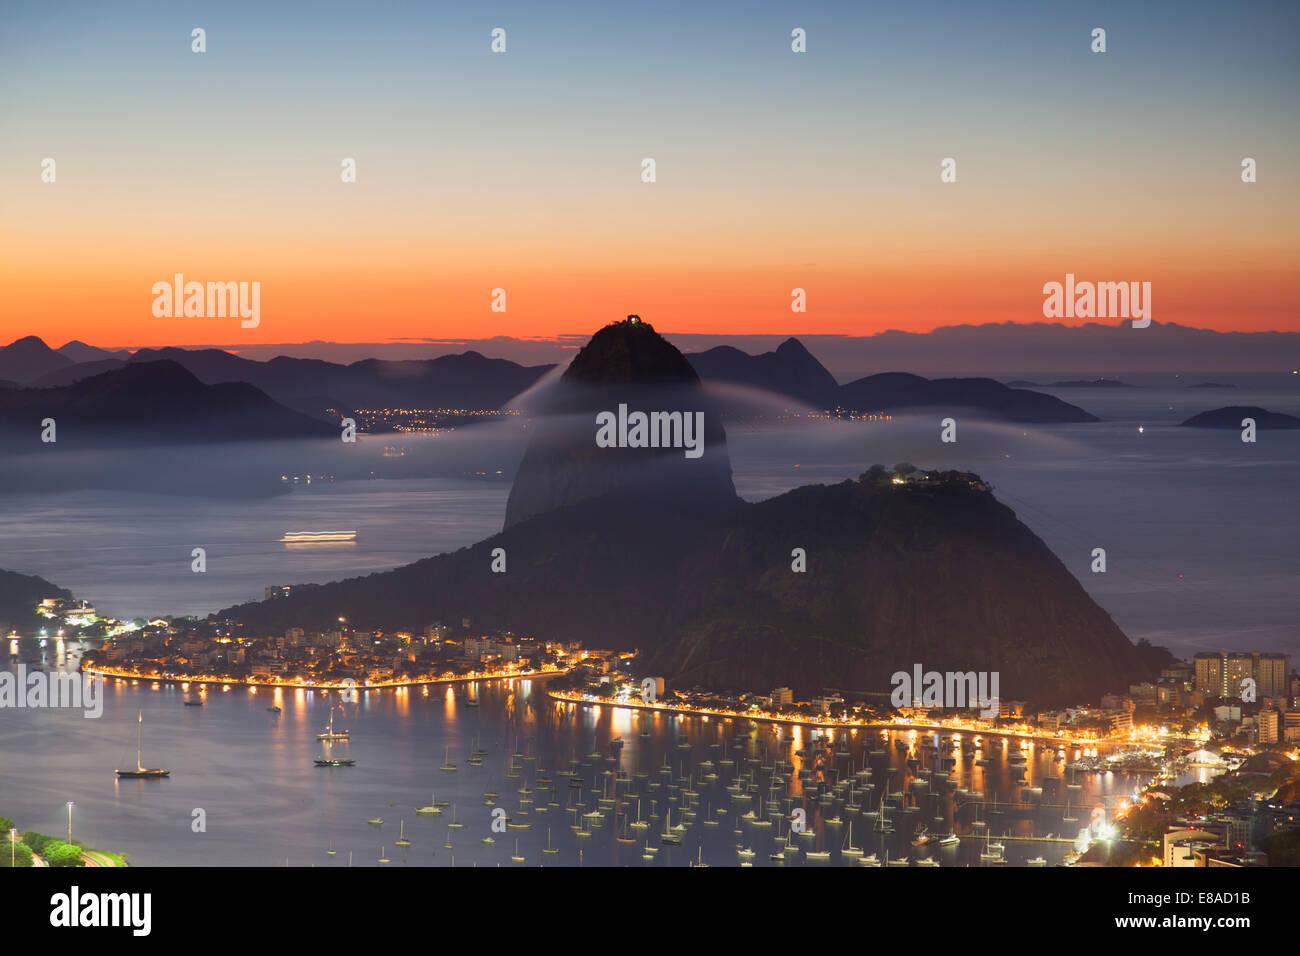 View of Sugarloaf Mountain and Botafogo Bay at dawn, Rio de Janeiro, Brazil - Stock Image